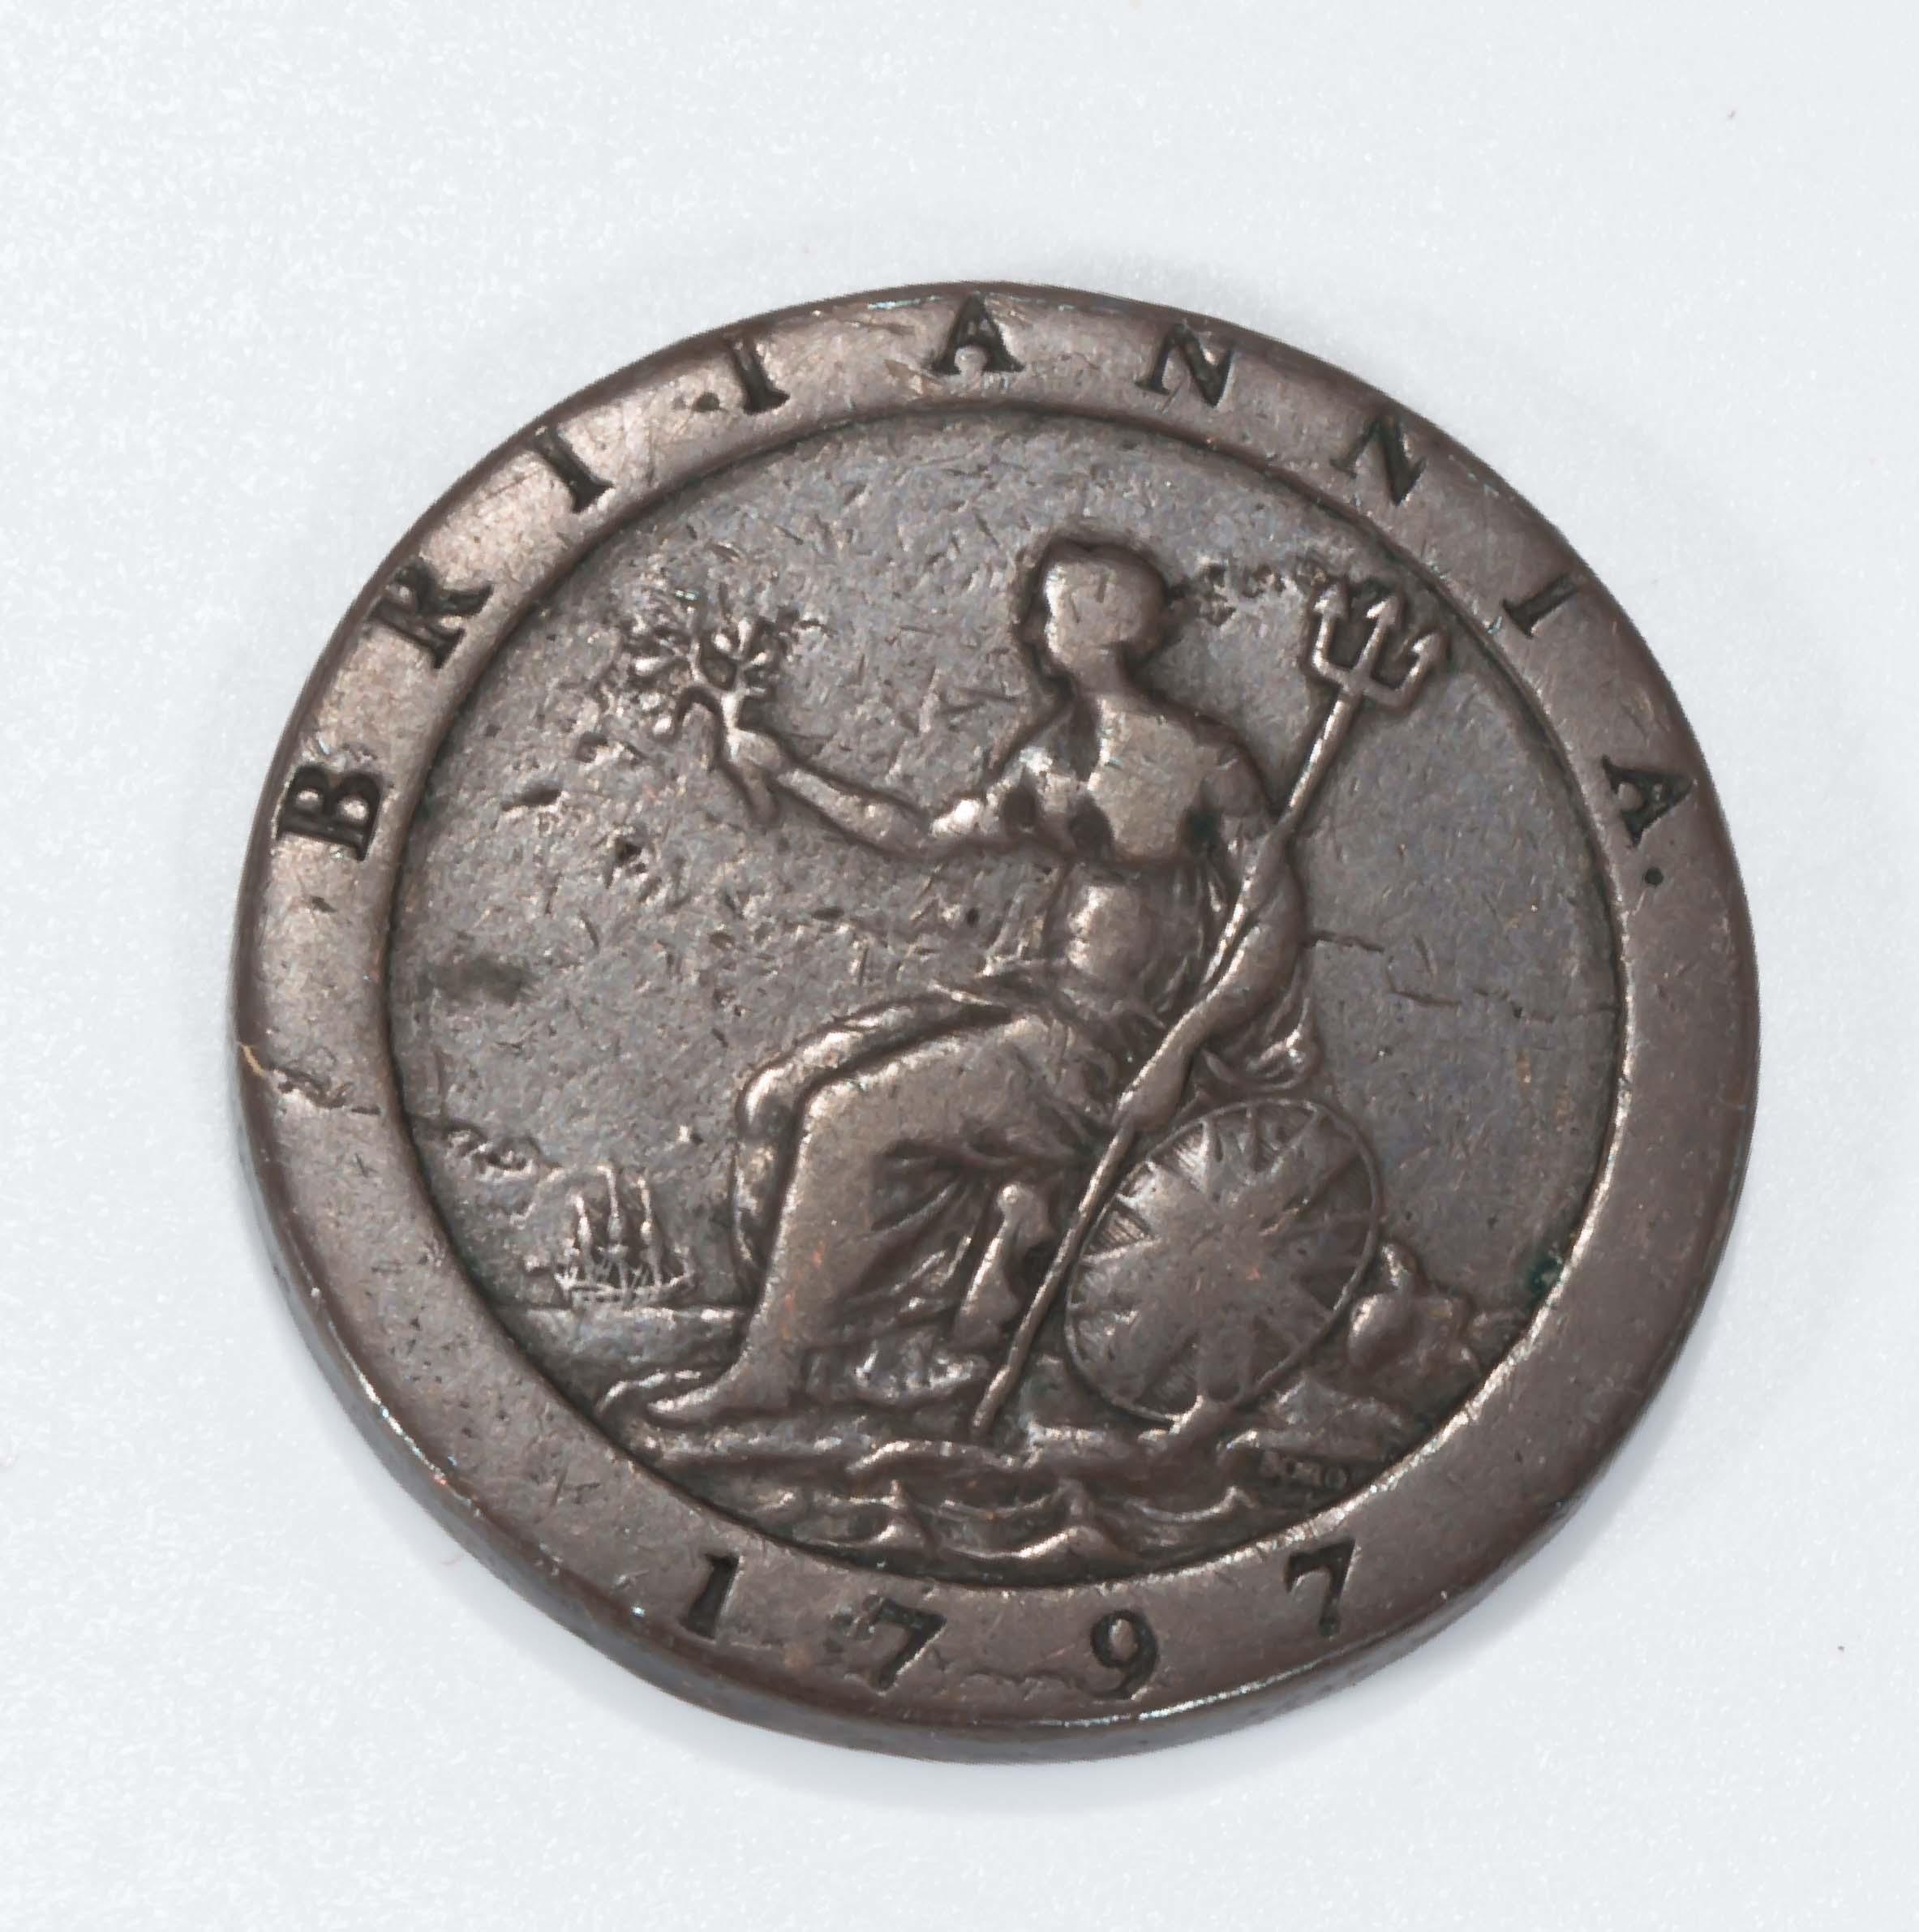 Lot 232 - A George III 1797 cartwheel penny